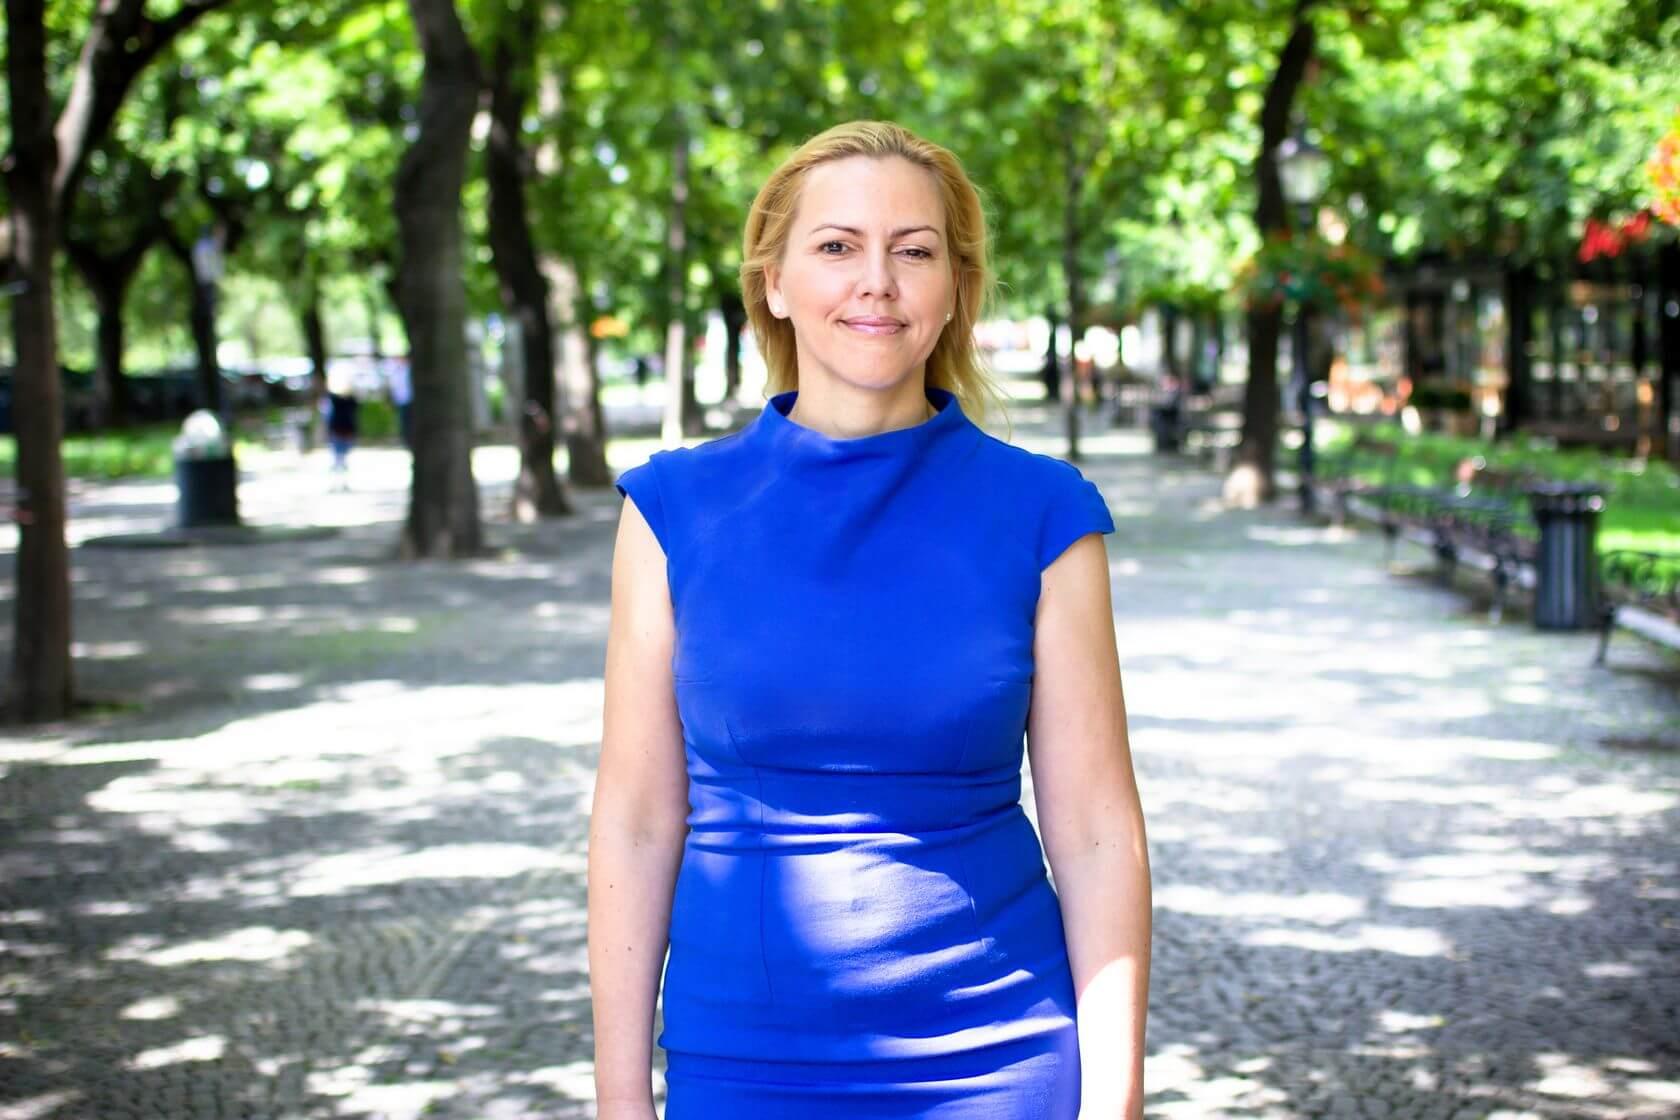 https://zuzanazahradnikova.sk/wp-content/uploads/2020/08/lr-0812-2u.jpg